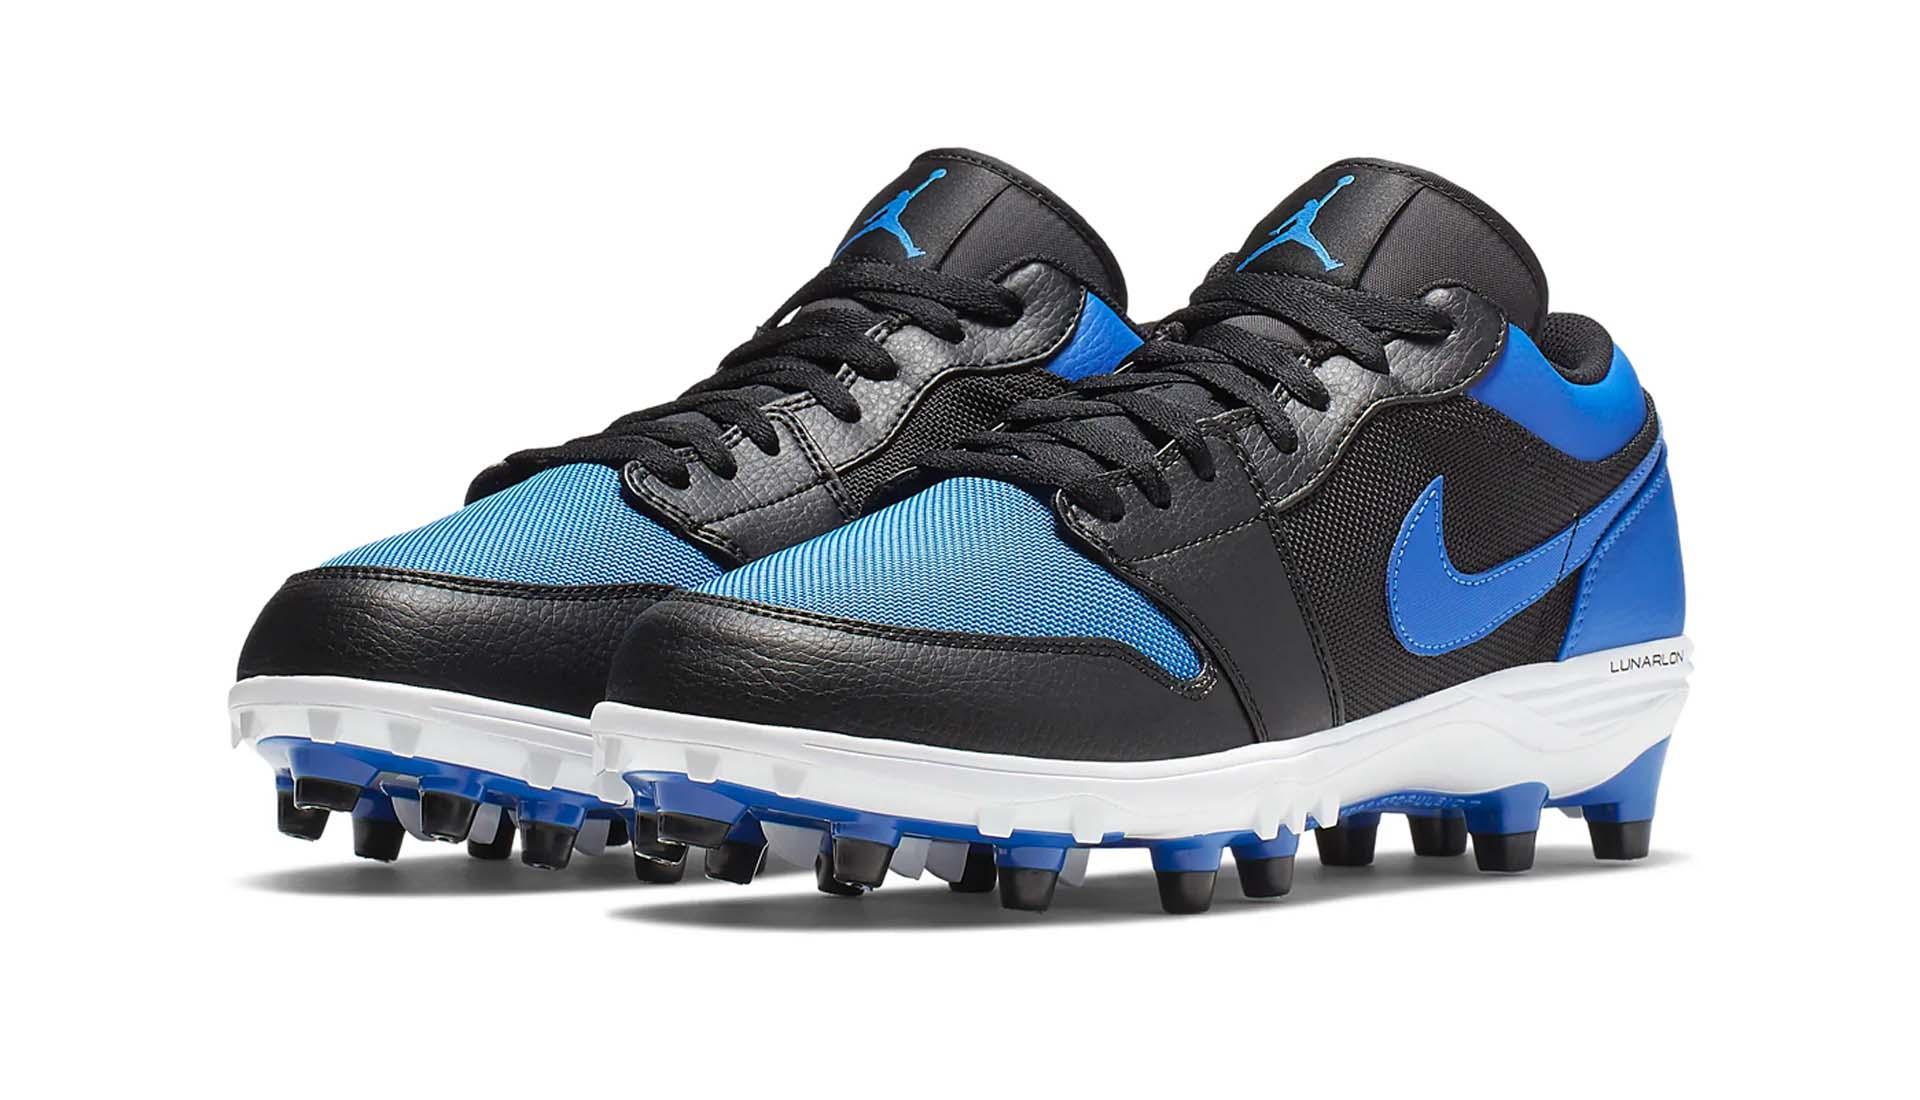 1664b4624 Nike Recreate The Air Jordan 1 Into Football Cleat - SoccerBible